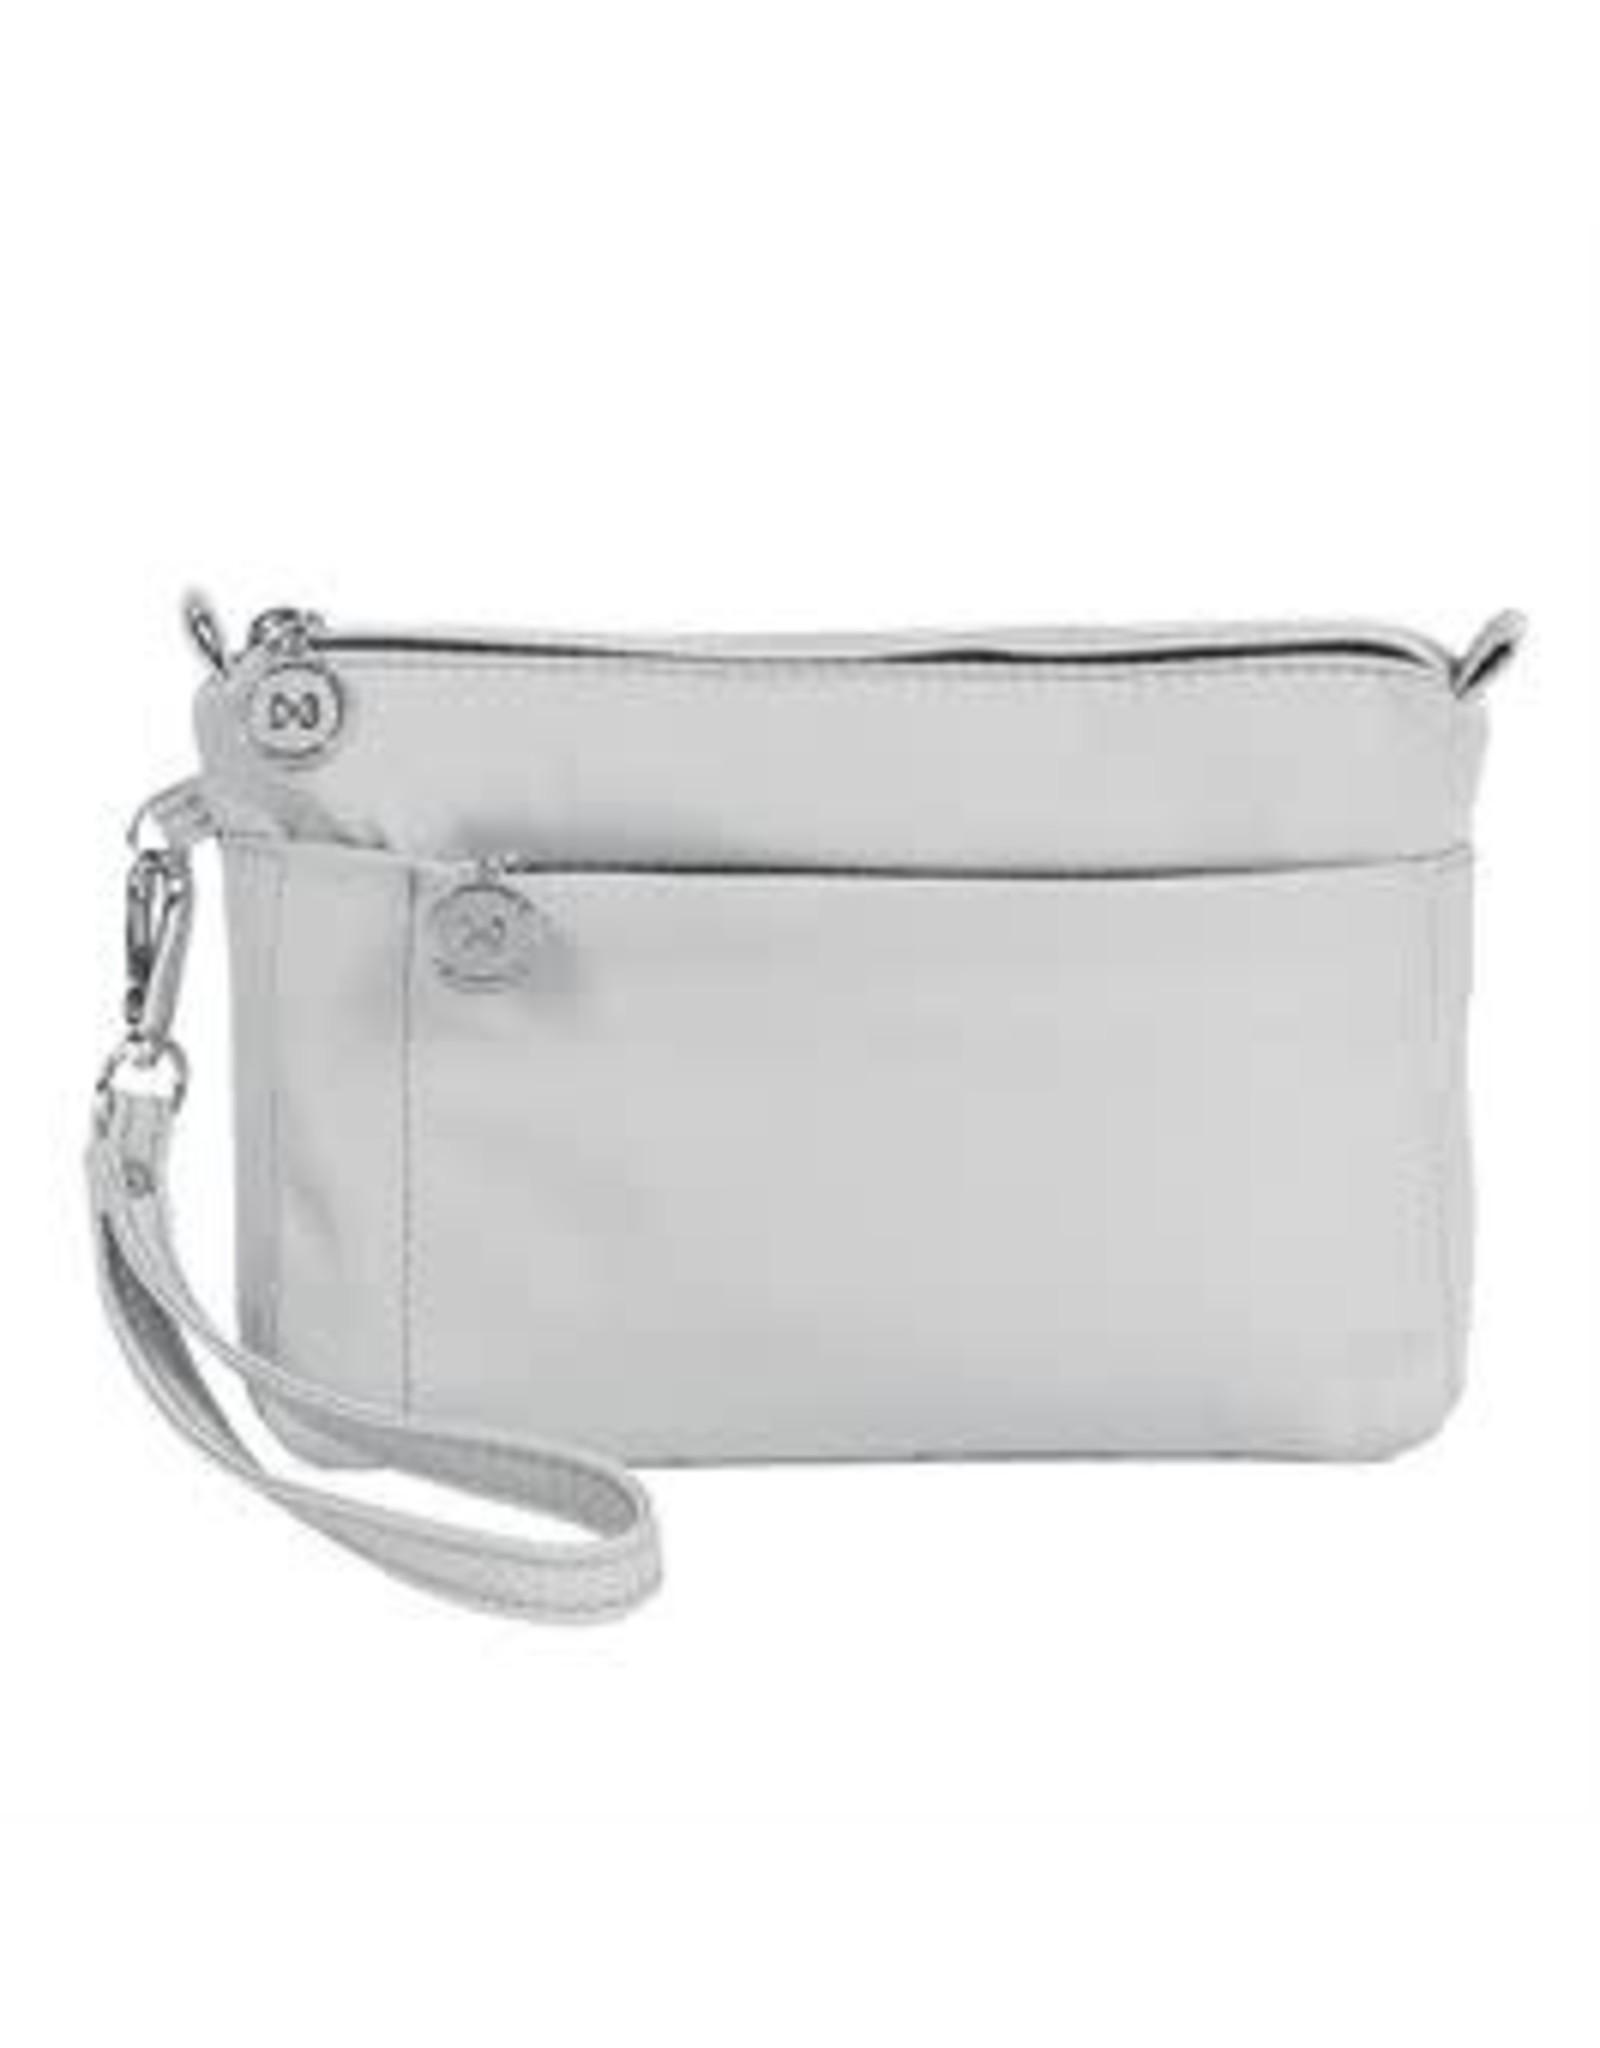 Coco & Carmen Ava Stash Bags